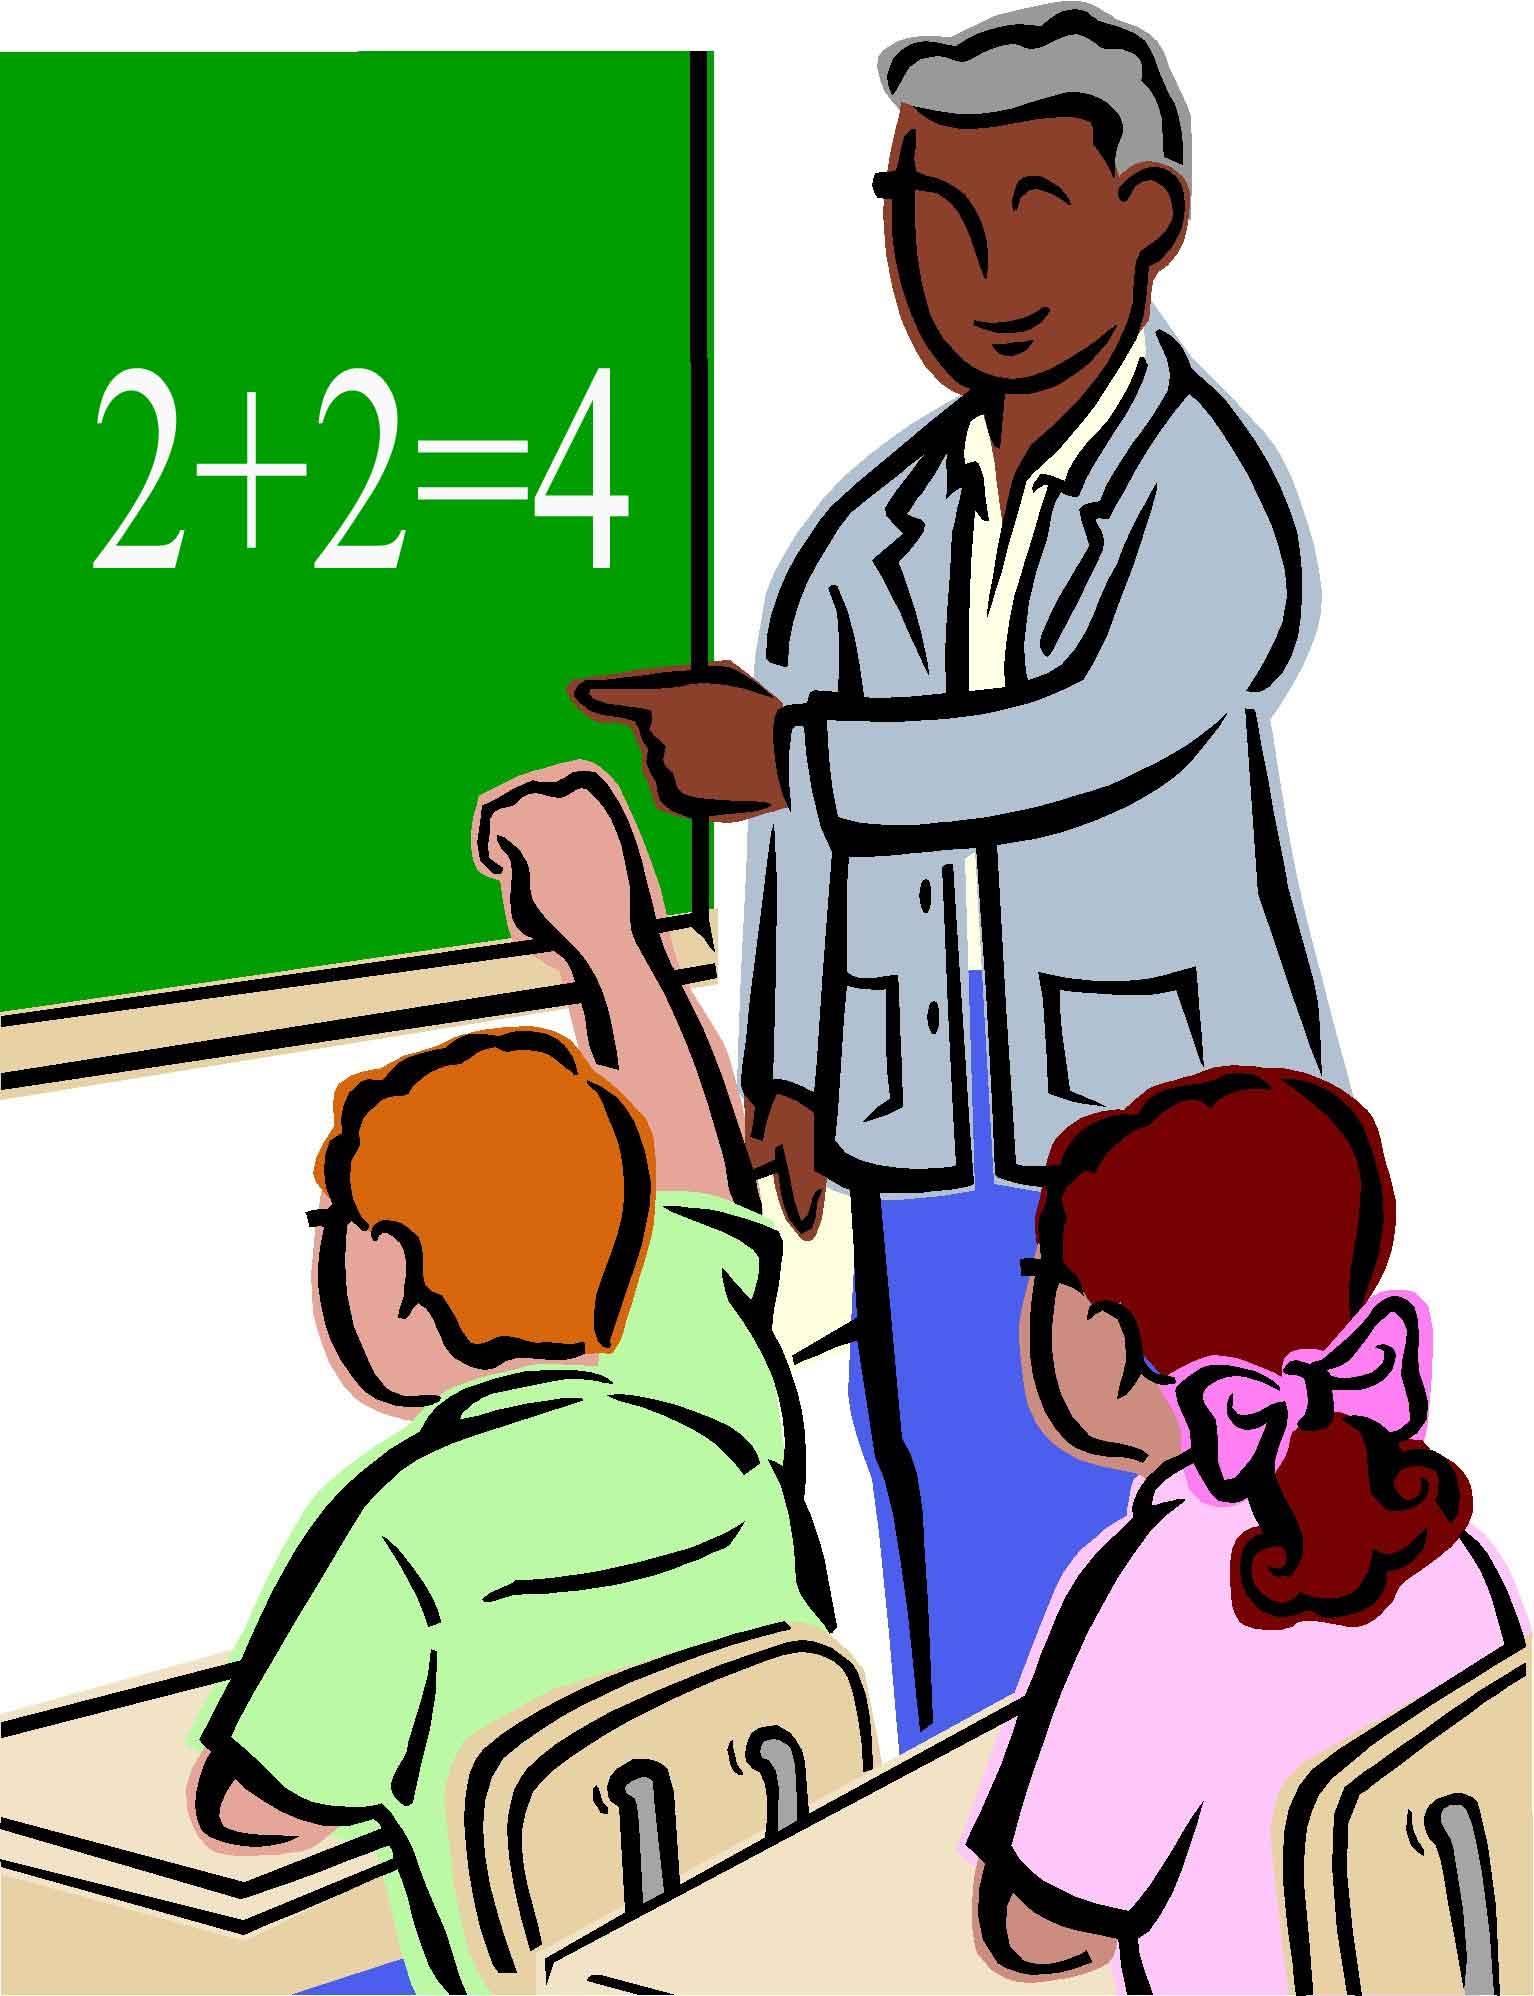 Indian clipart school teacher Clipart clipart math collection for